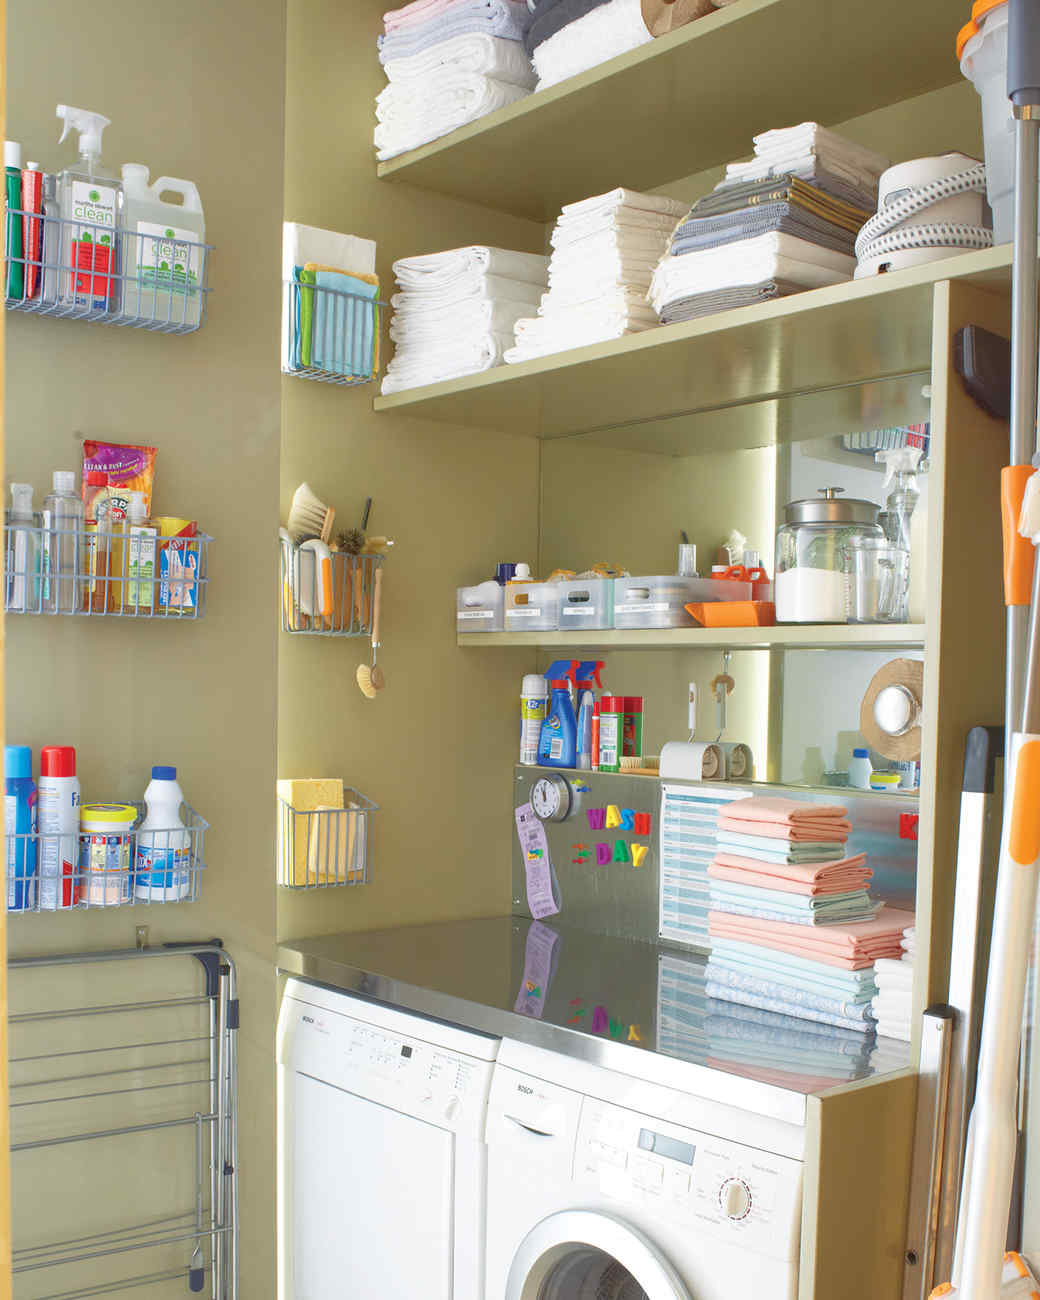 12 Essential Laundry Room Organizing Tips   Martha Stewart on Small Laundry Room Organization Ideas  id=85104